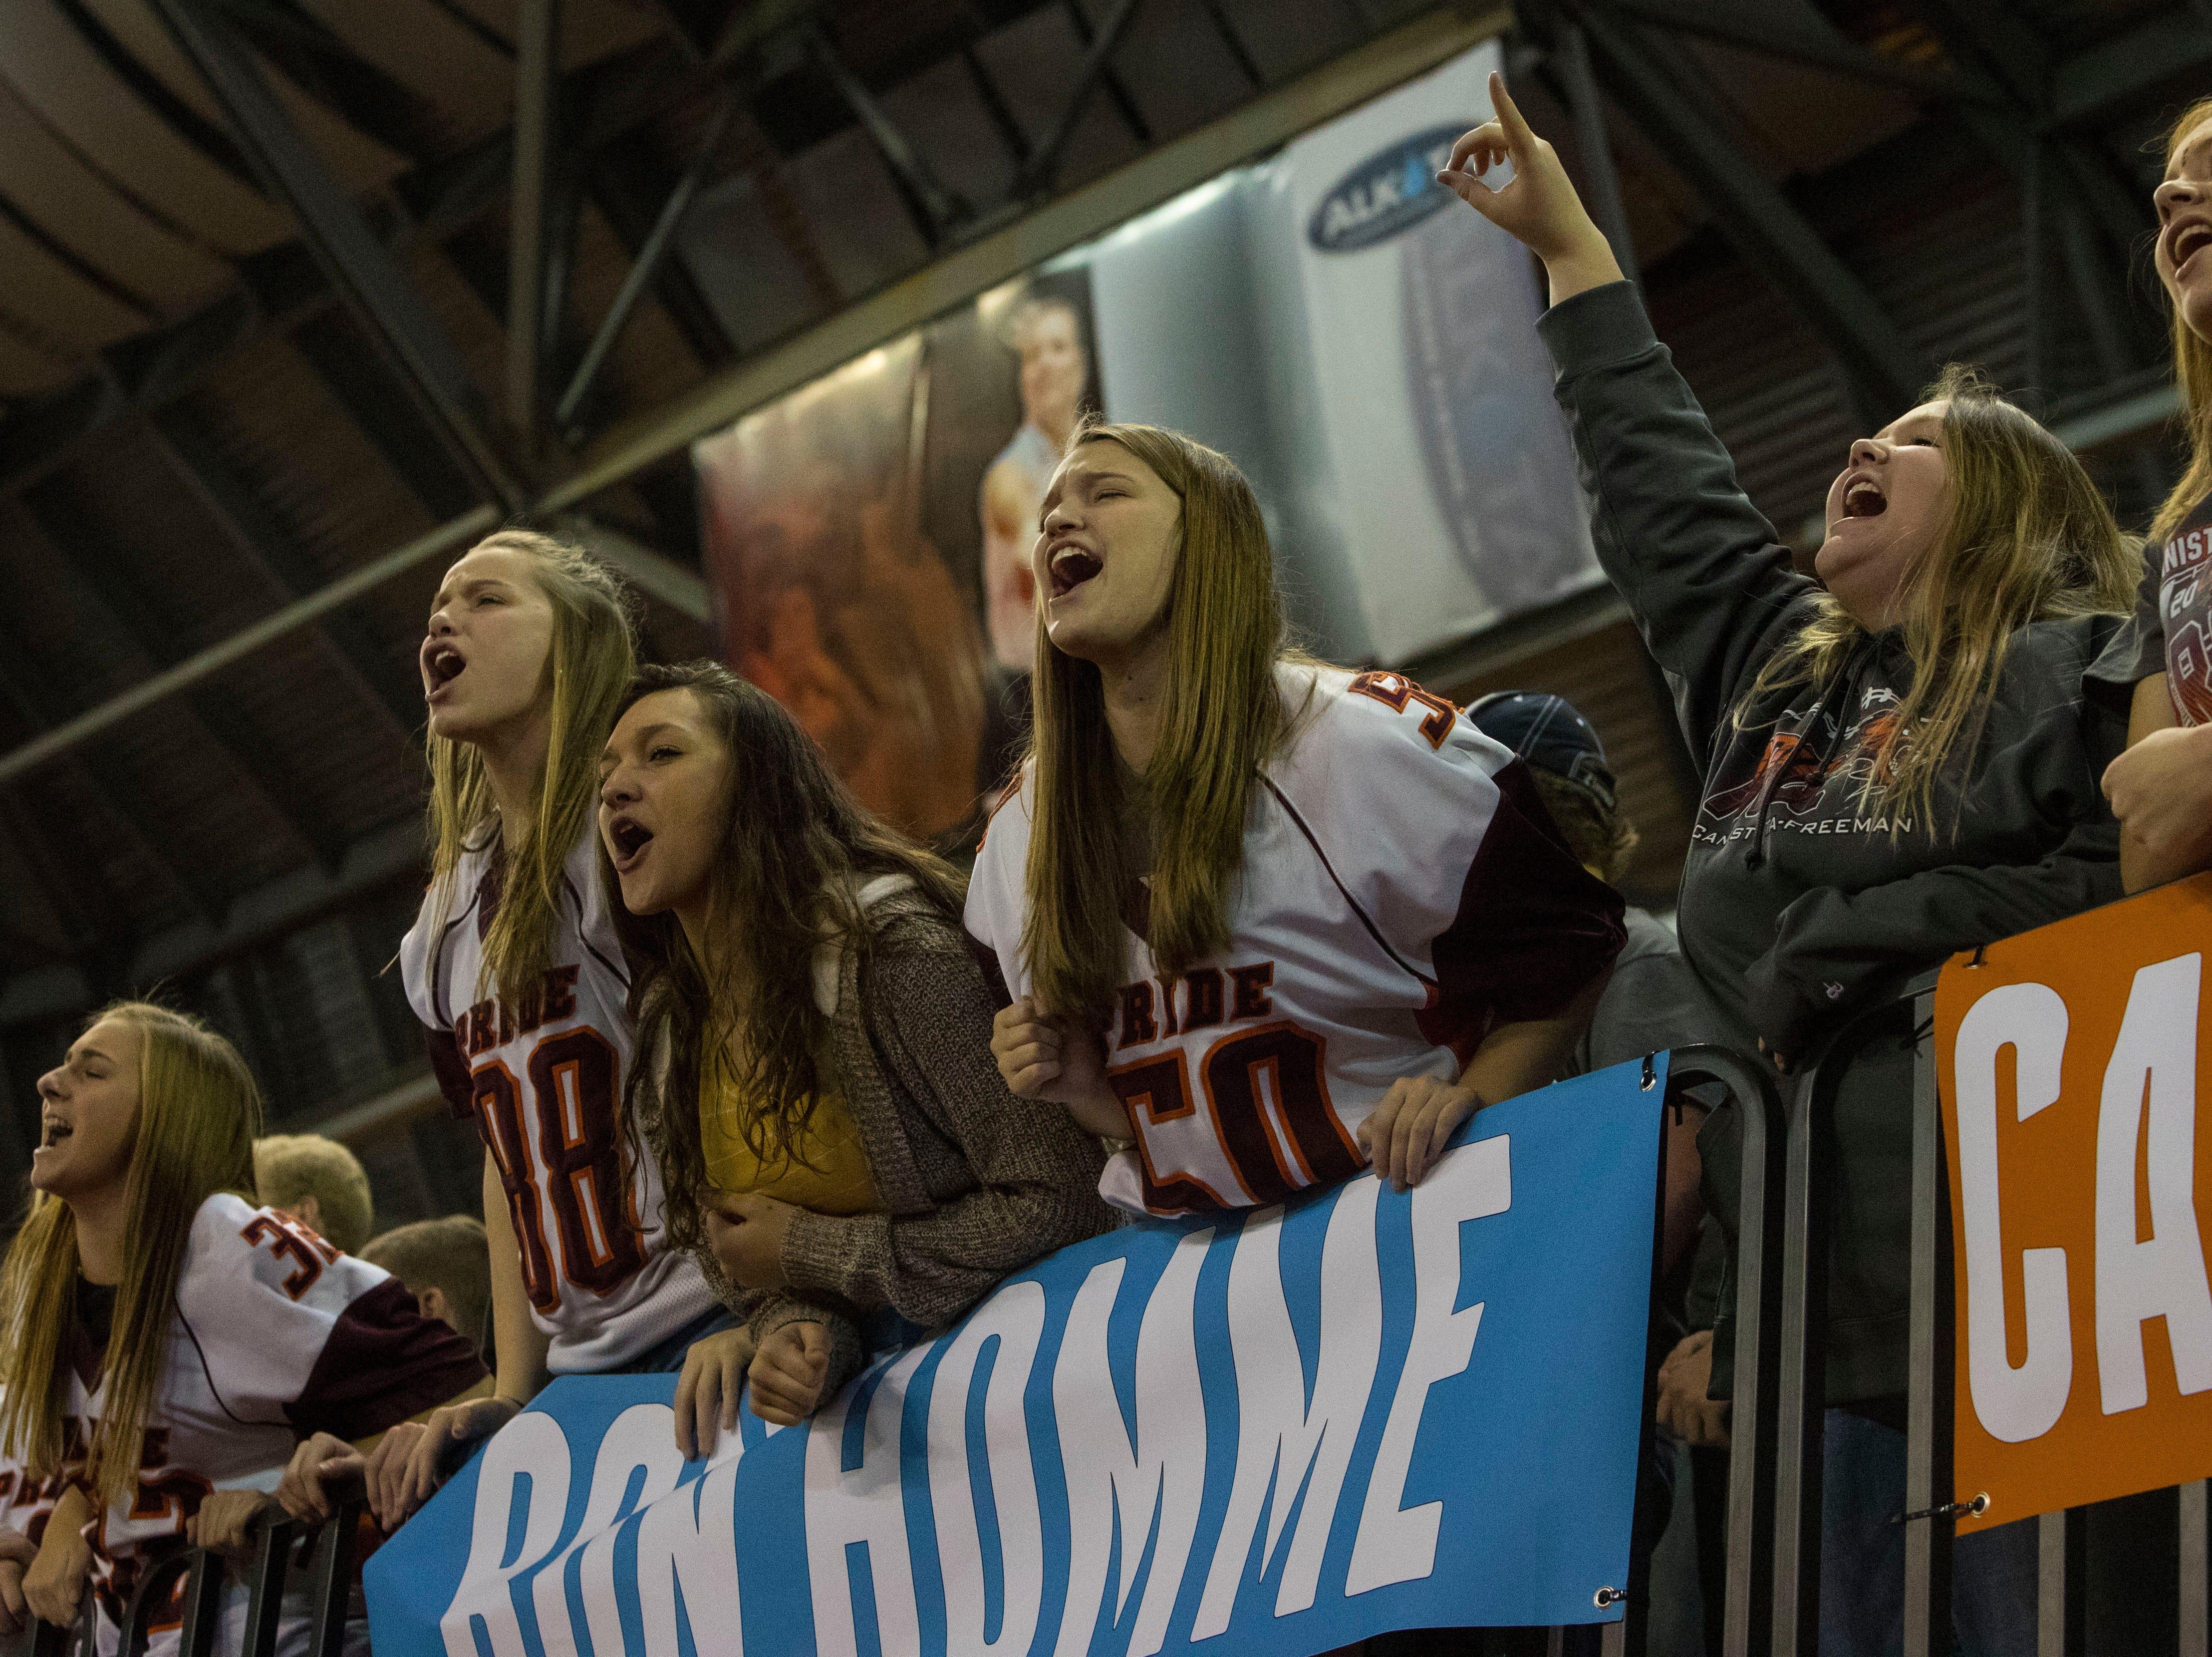 Howard fans react during a game against Canistota/Freeman, Thursday, Nov. 8, 2018 at the DakotaDome in Vermillion, S.D.